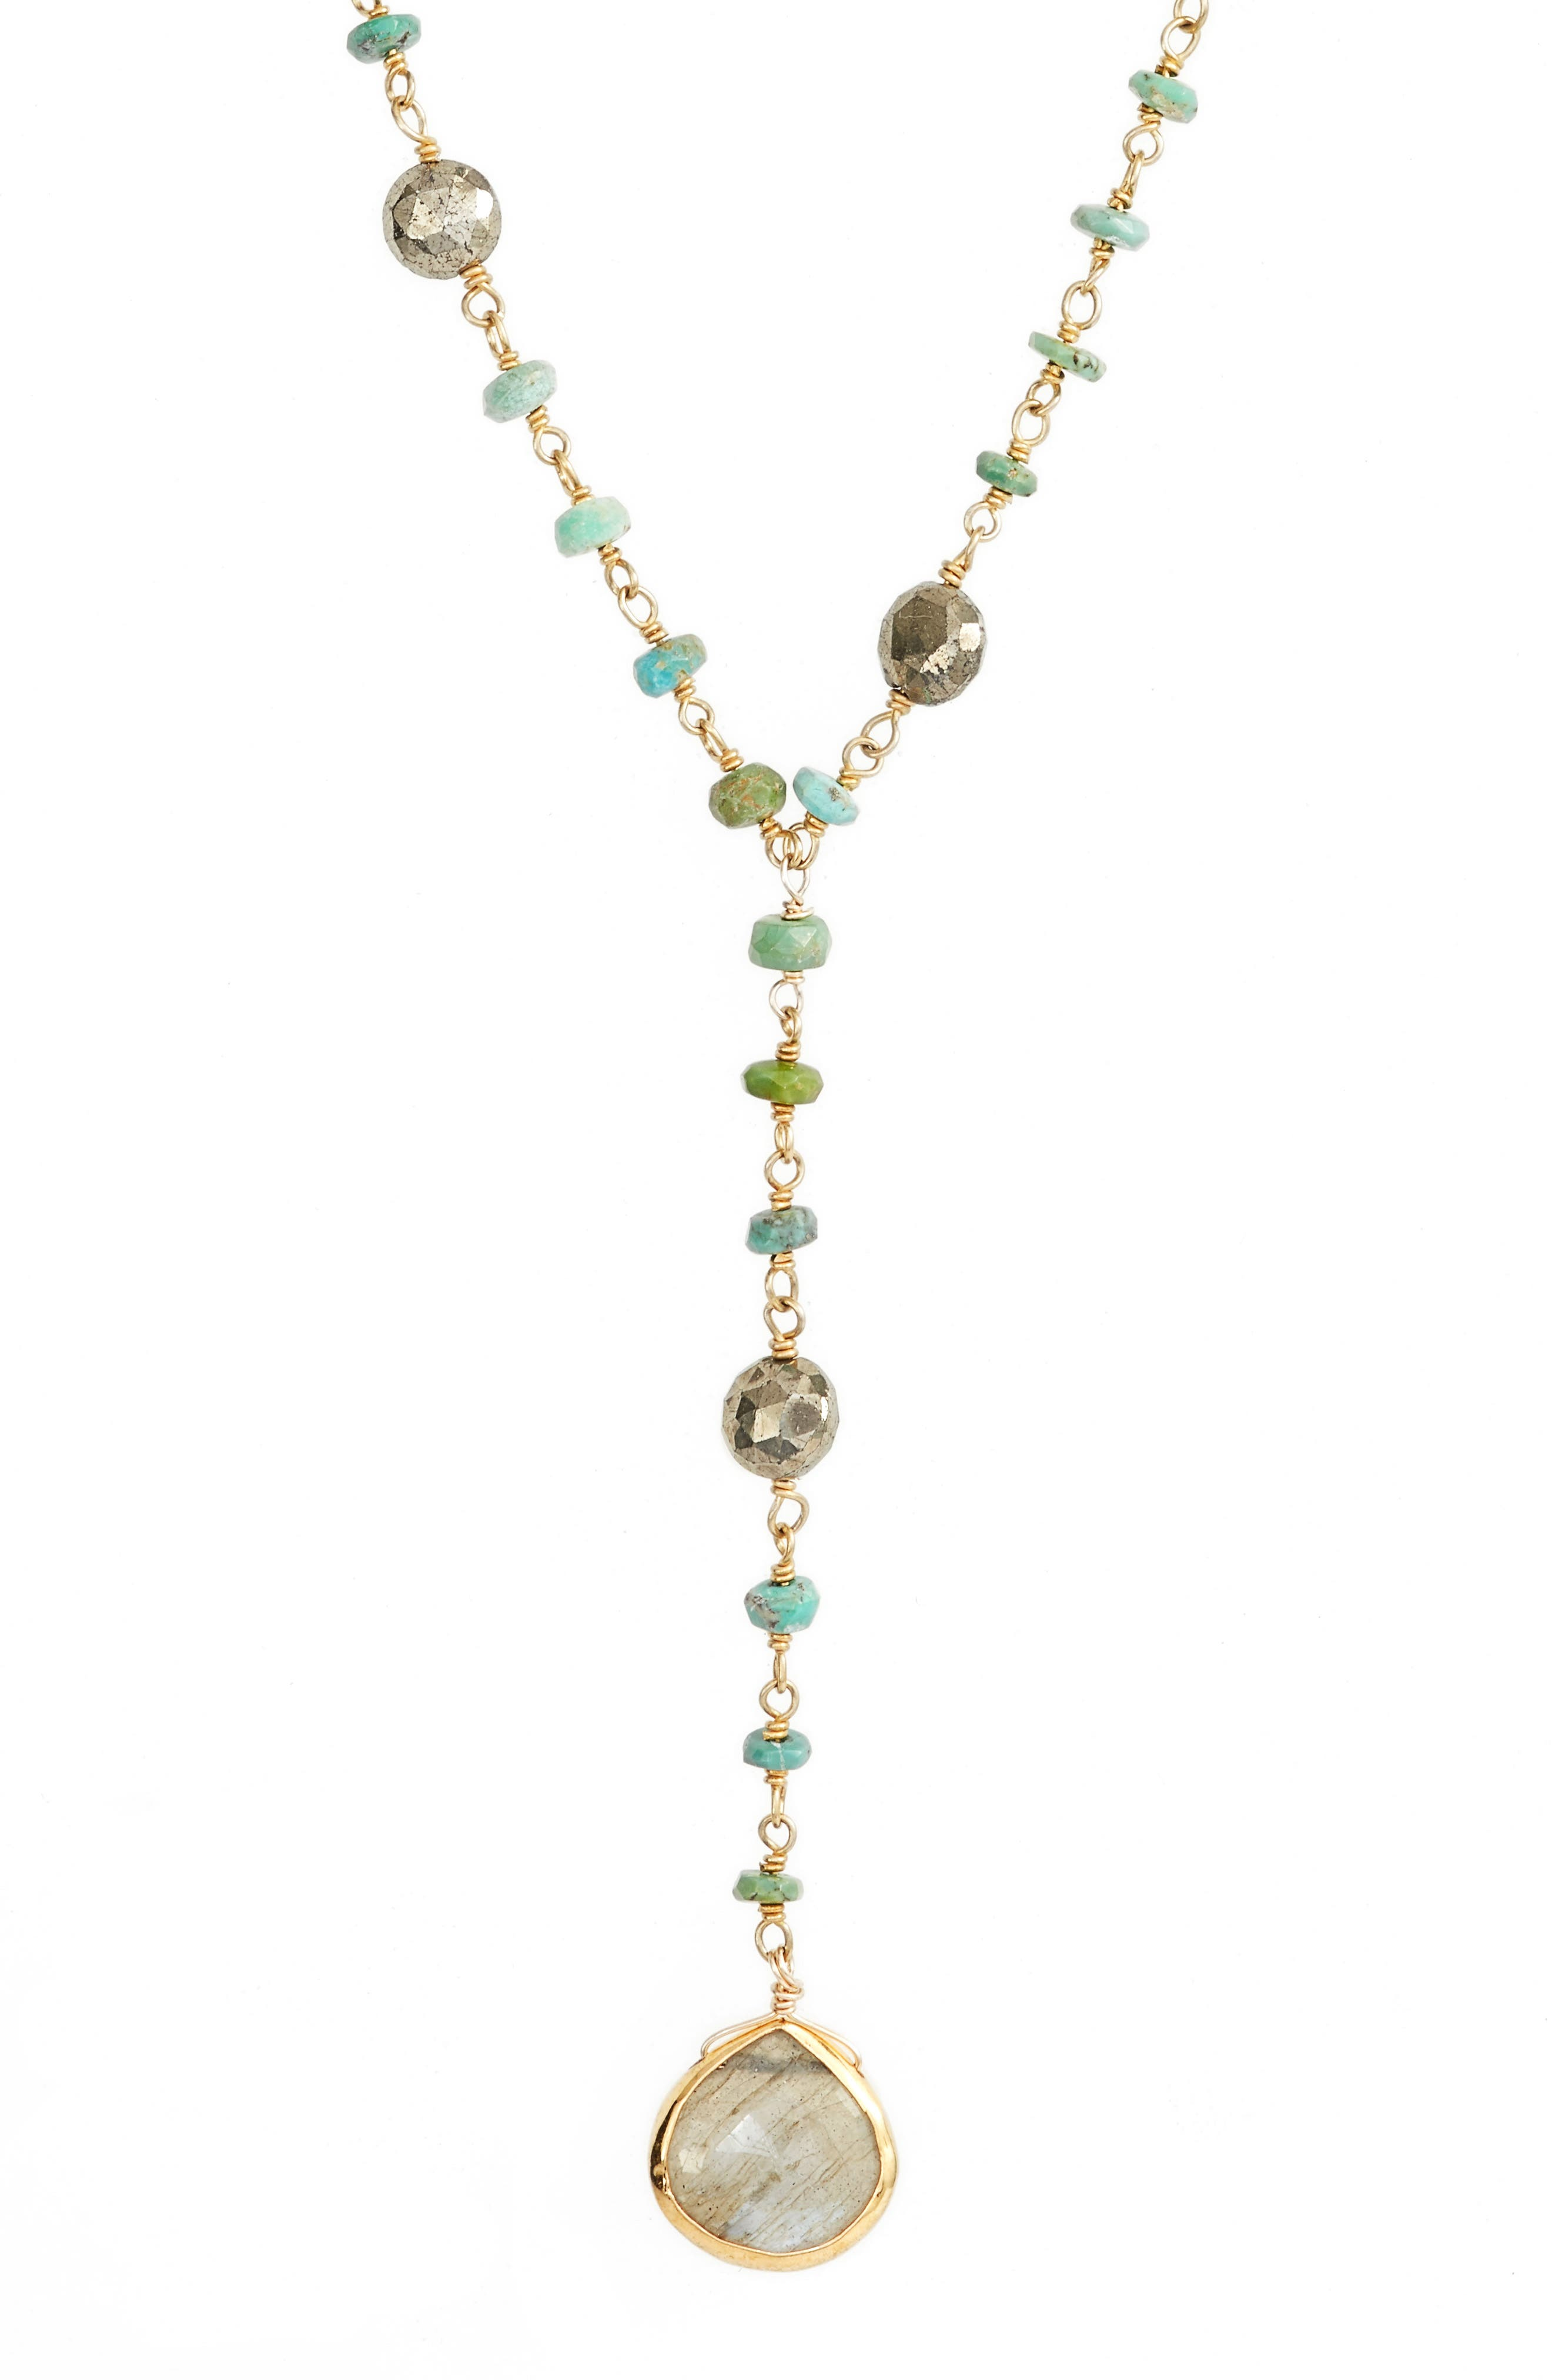 Yaeli Satellite 24 Semiprecious Stone Y-Necklace,                             Alternate thumbnail 2, color,                             Turquoise / Labradorite